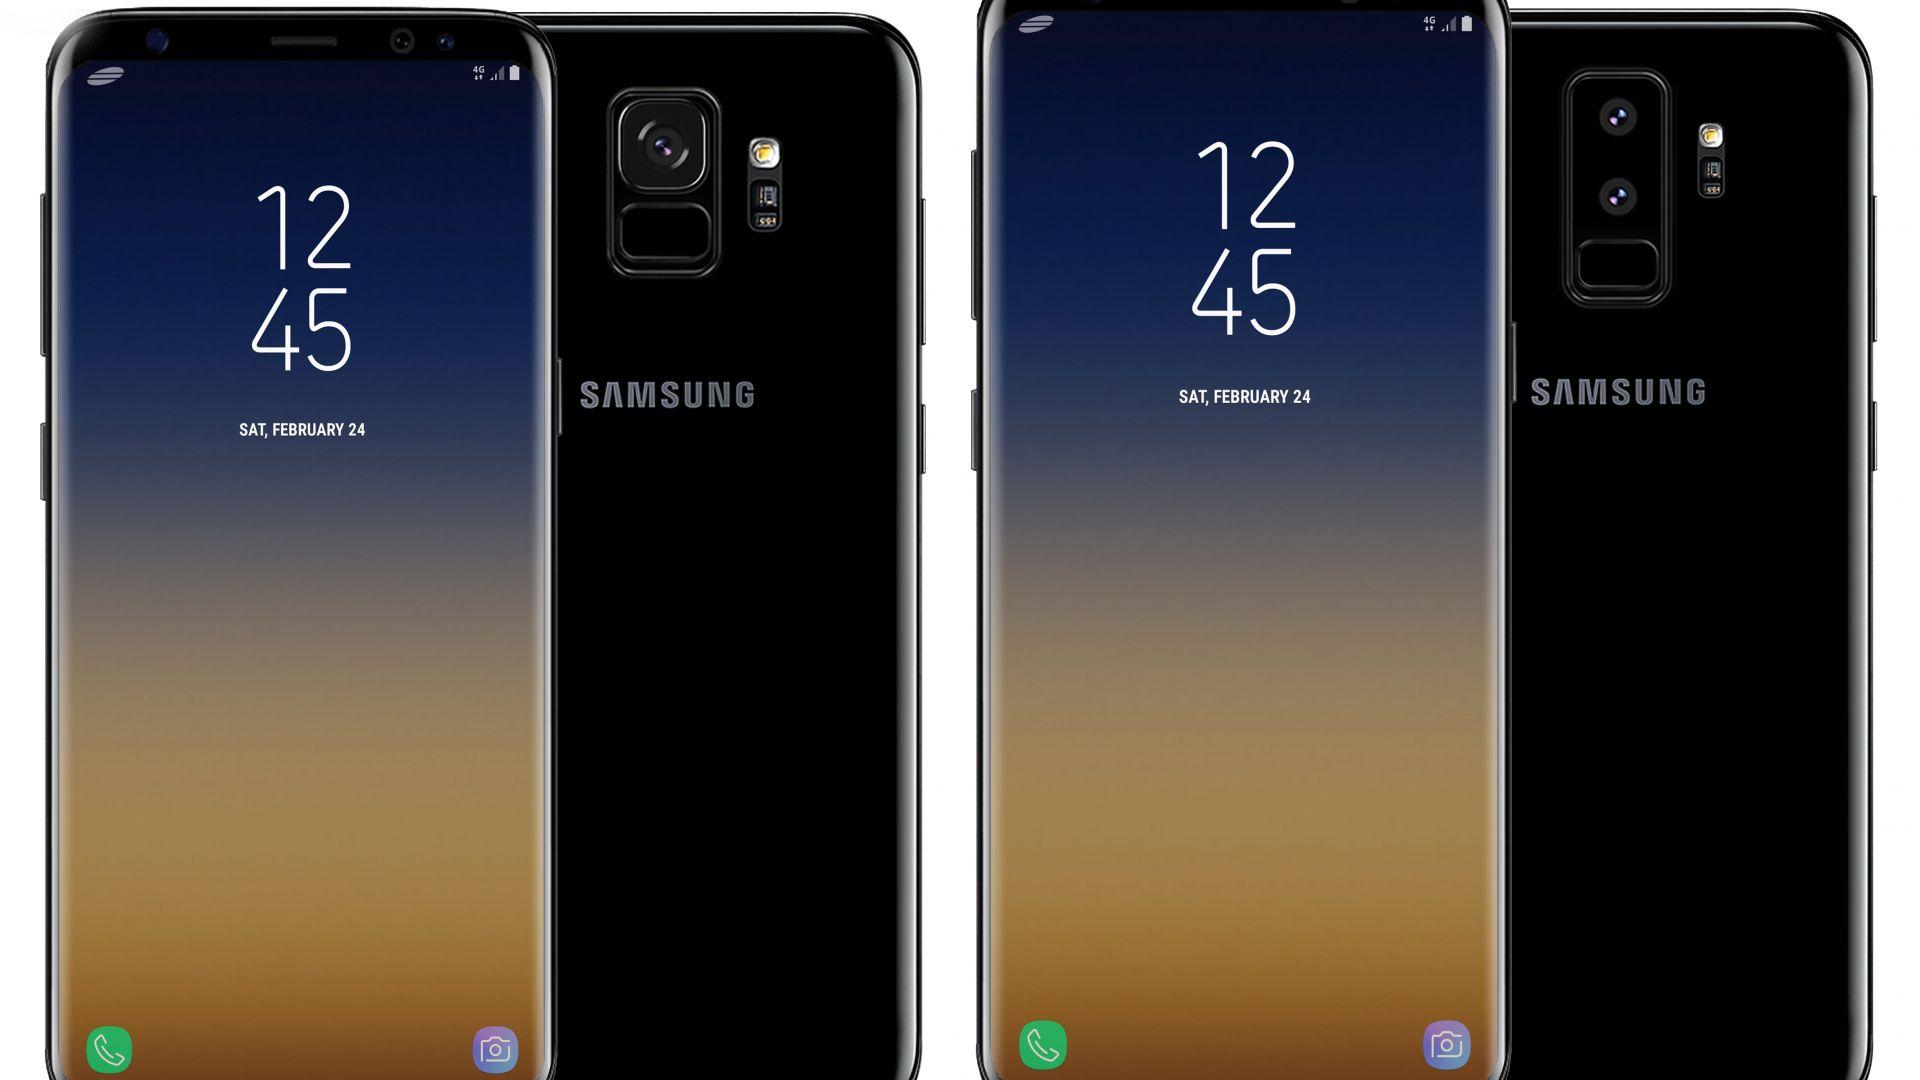 Samsung Galaxy S9 Wallpapers: Wallpaper Samsung Galaxy S9, 4k, Hi-Tech #16675